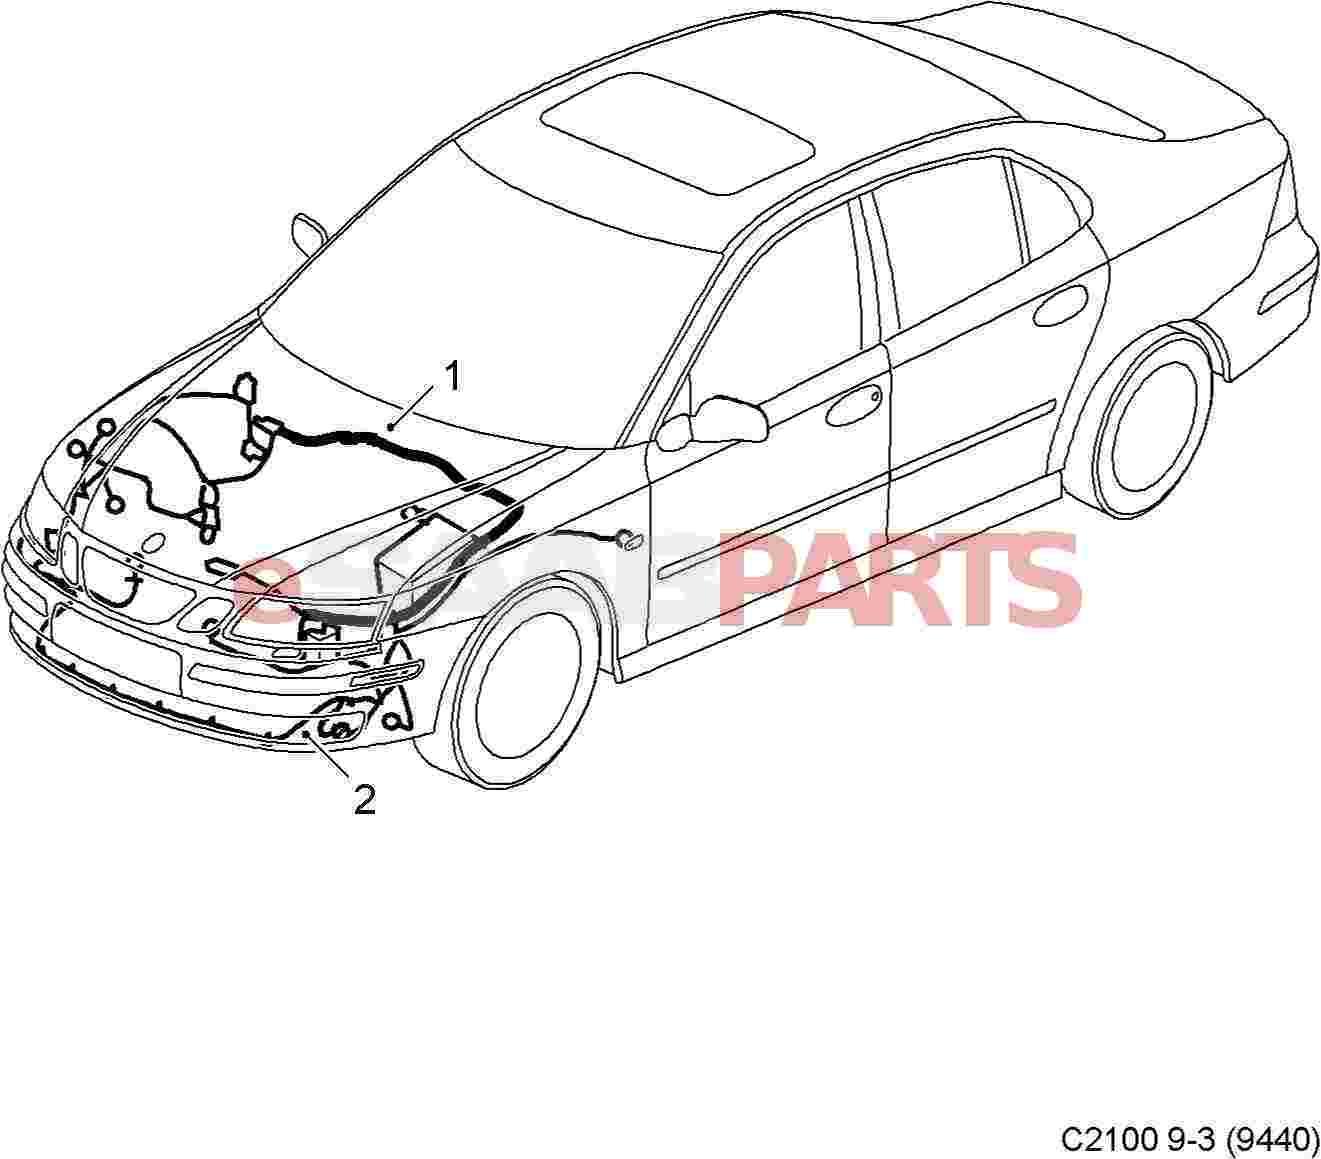 2006 Suzuki Forenza Stereo Wiring Diagram